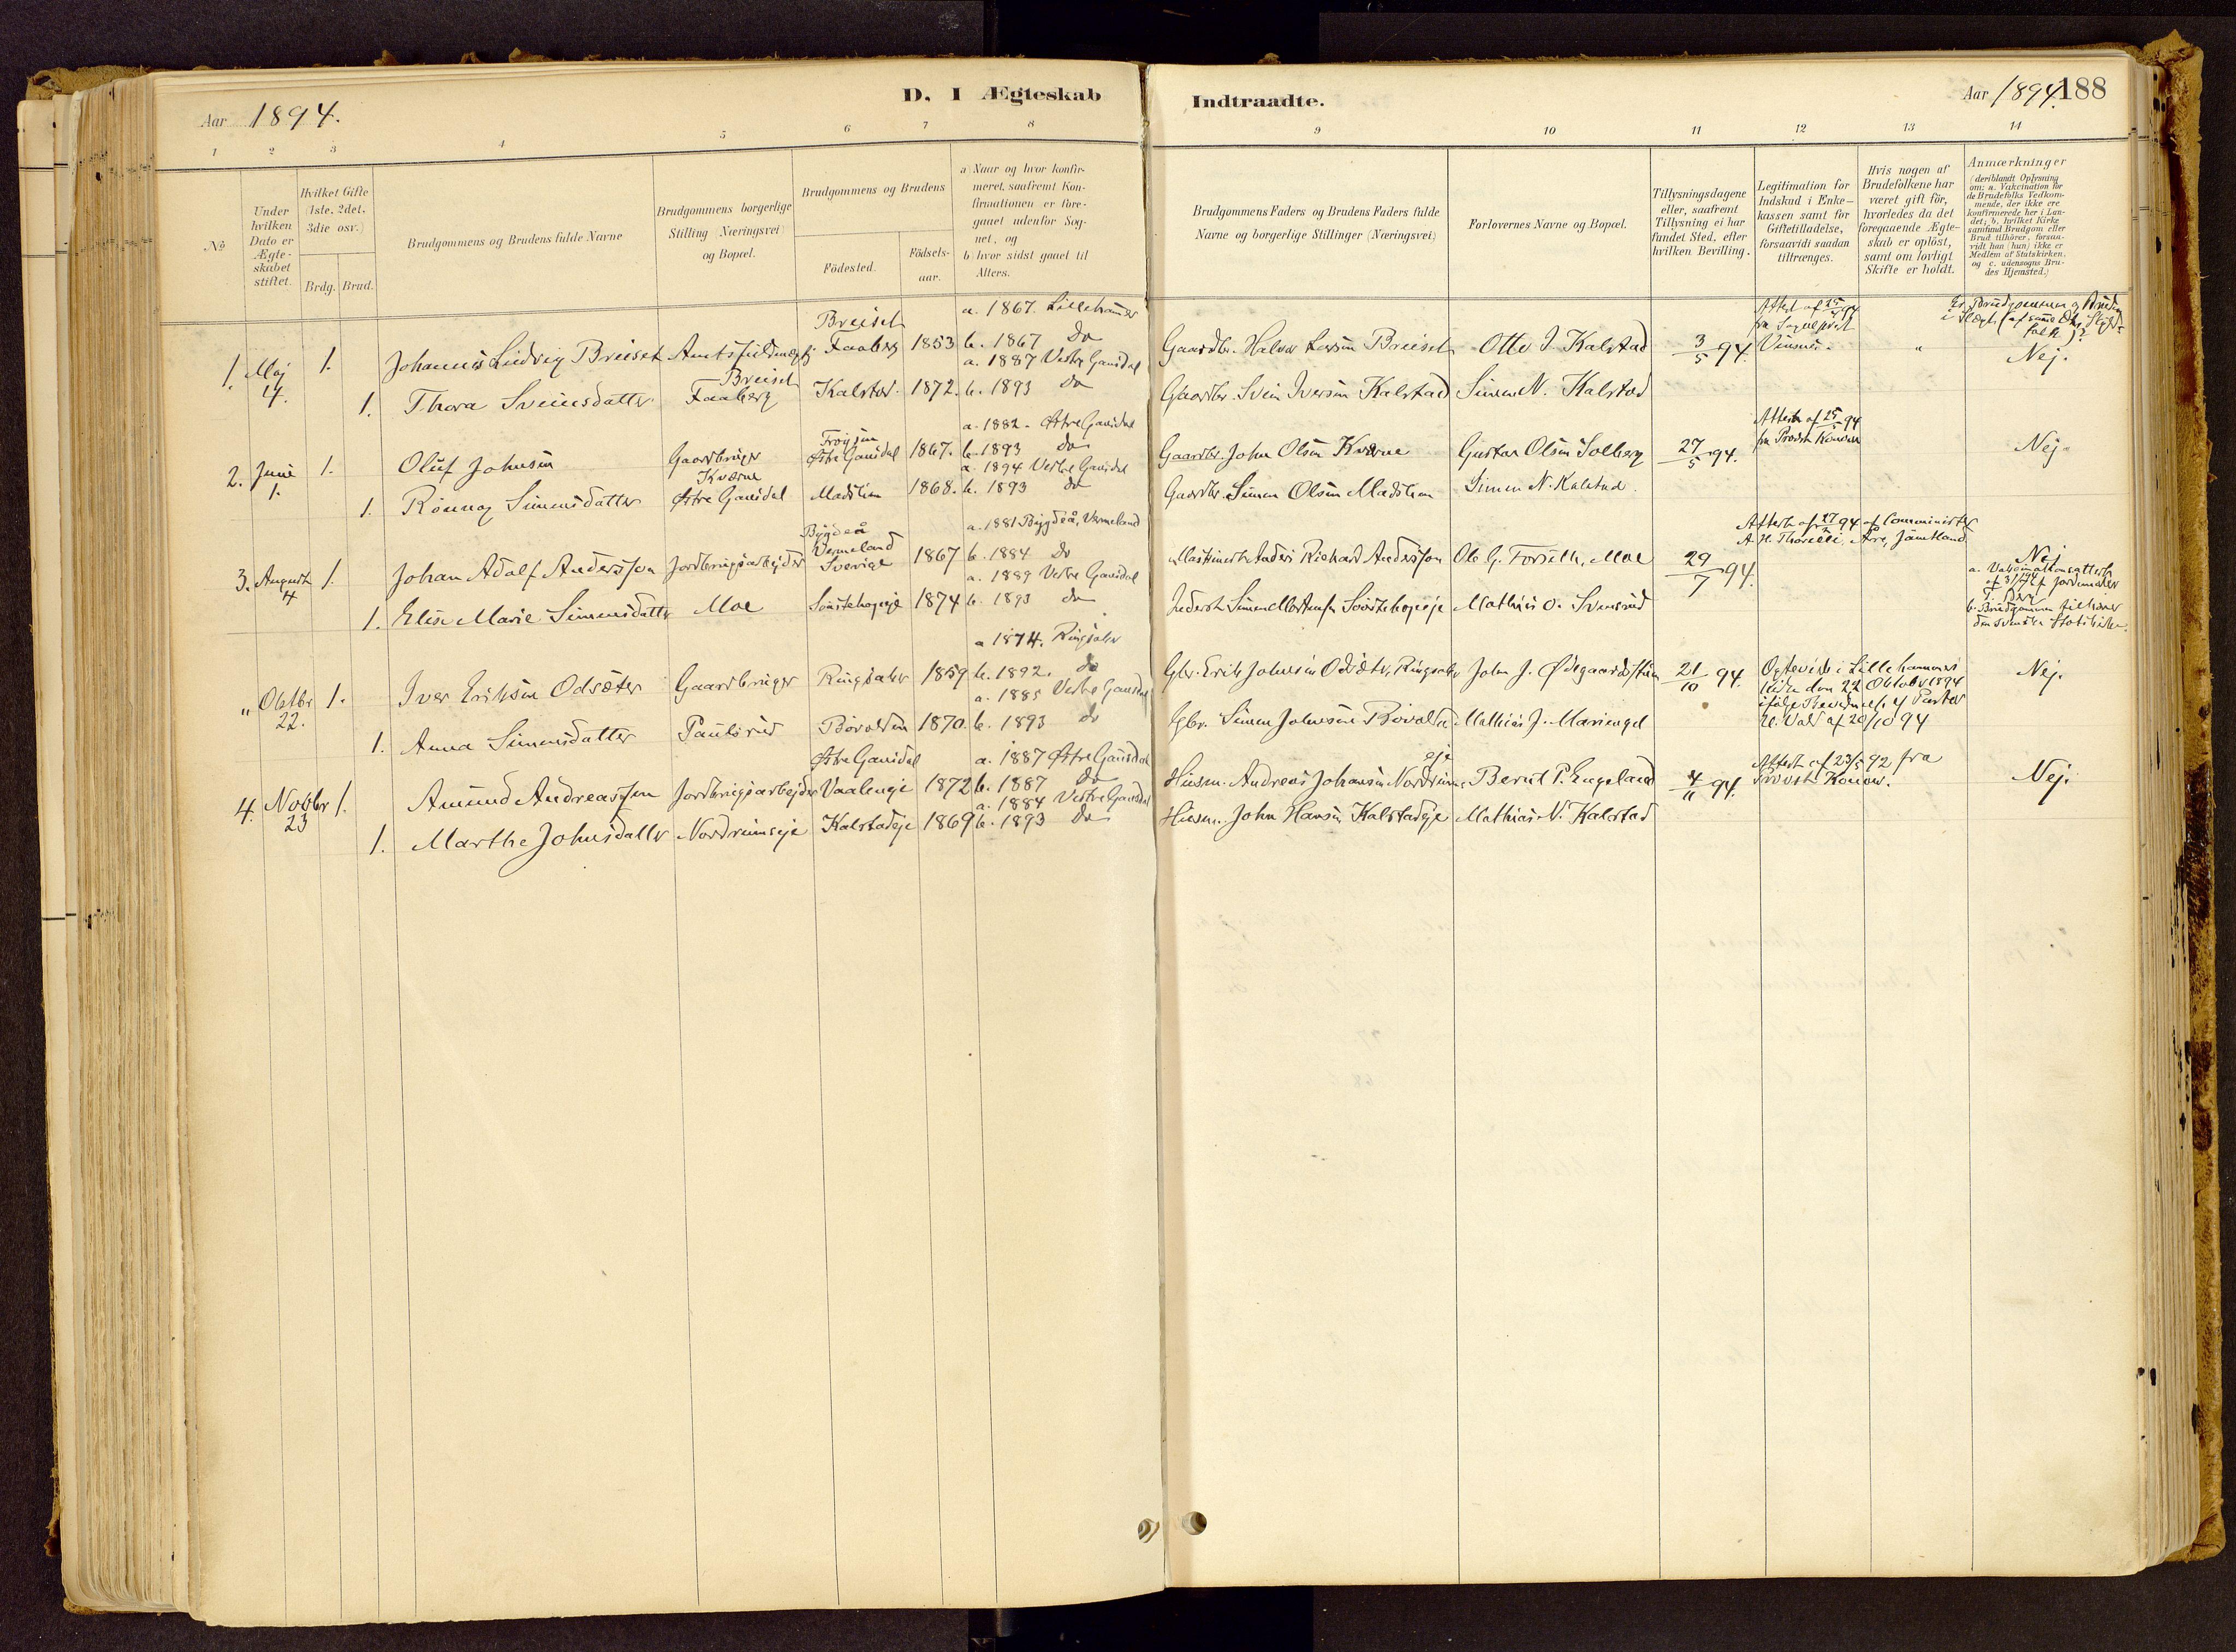 SAH, Vestre Gausdal prestekontor, Ministerialbok nr. 1, 1887-1914, s. 188